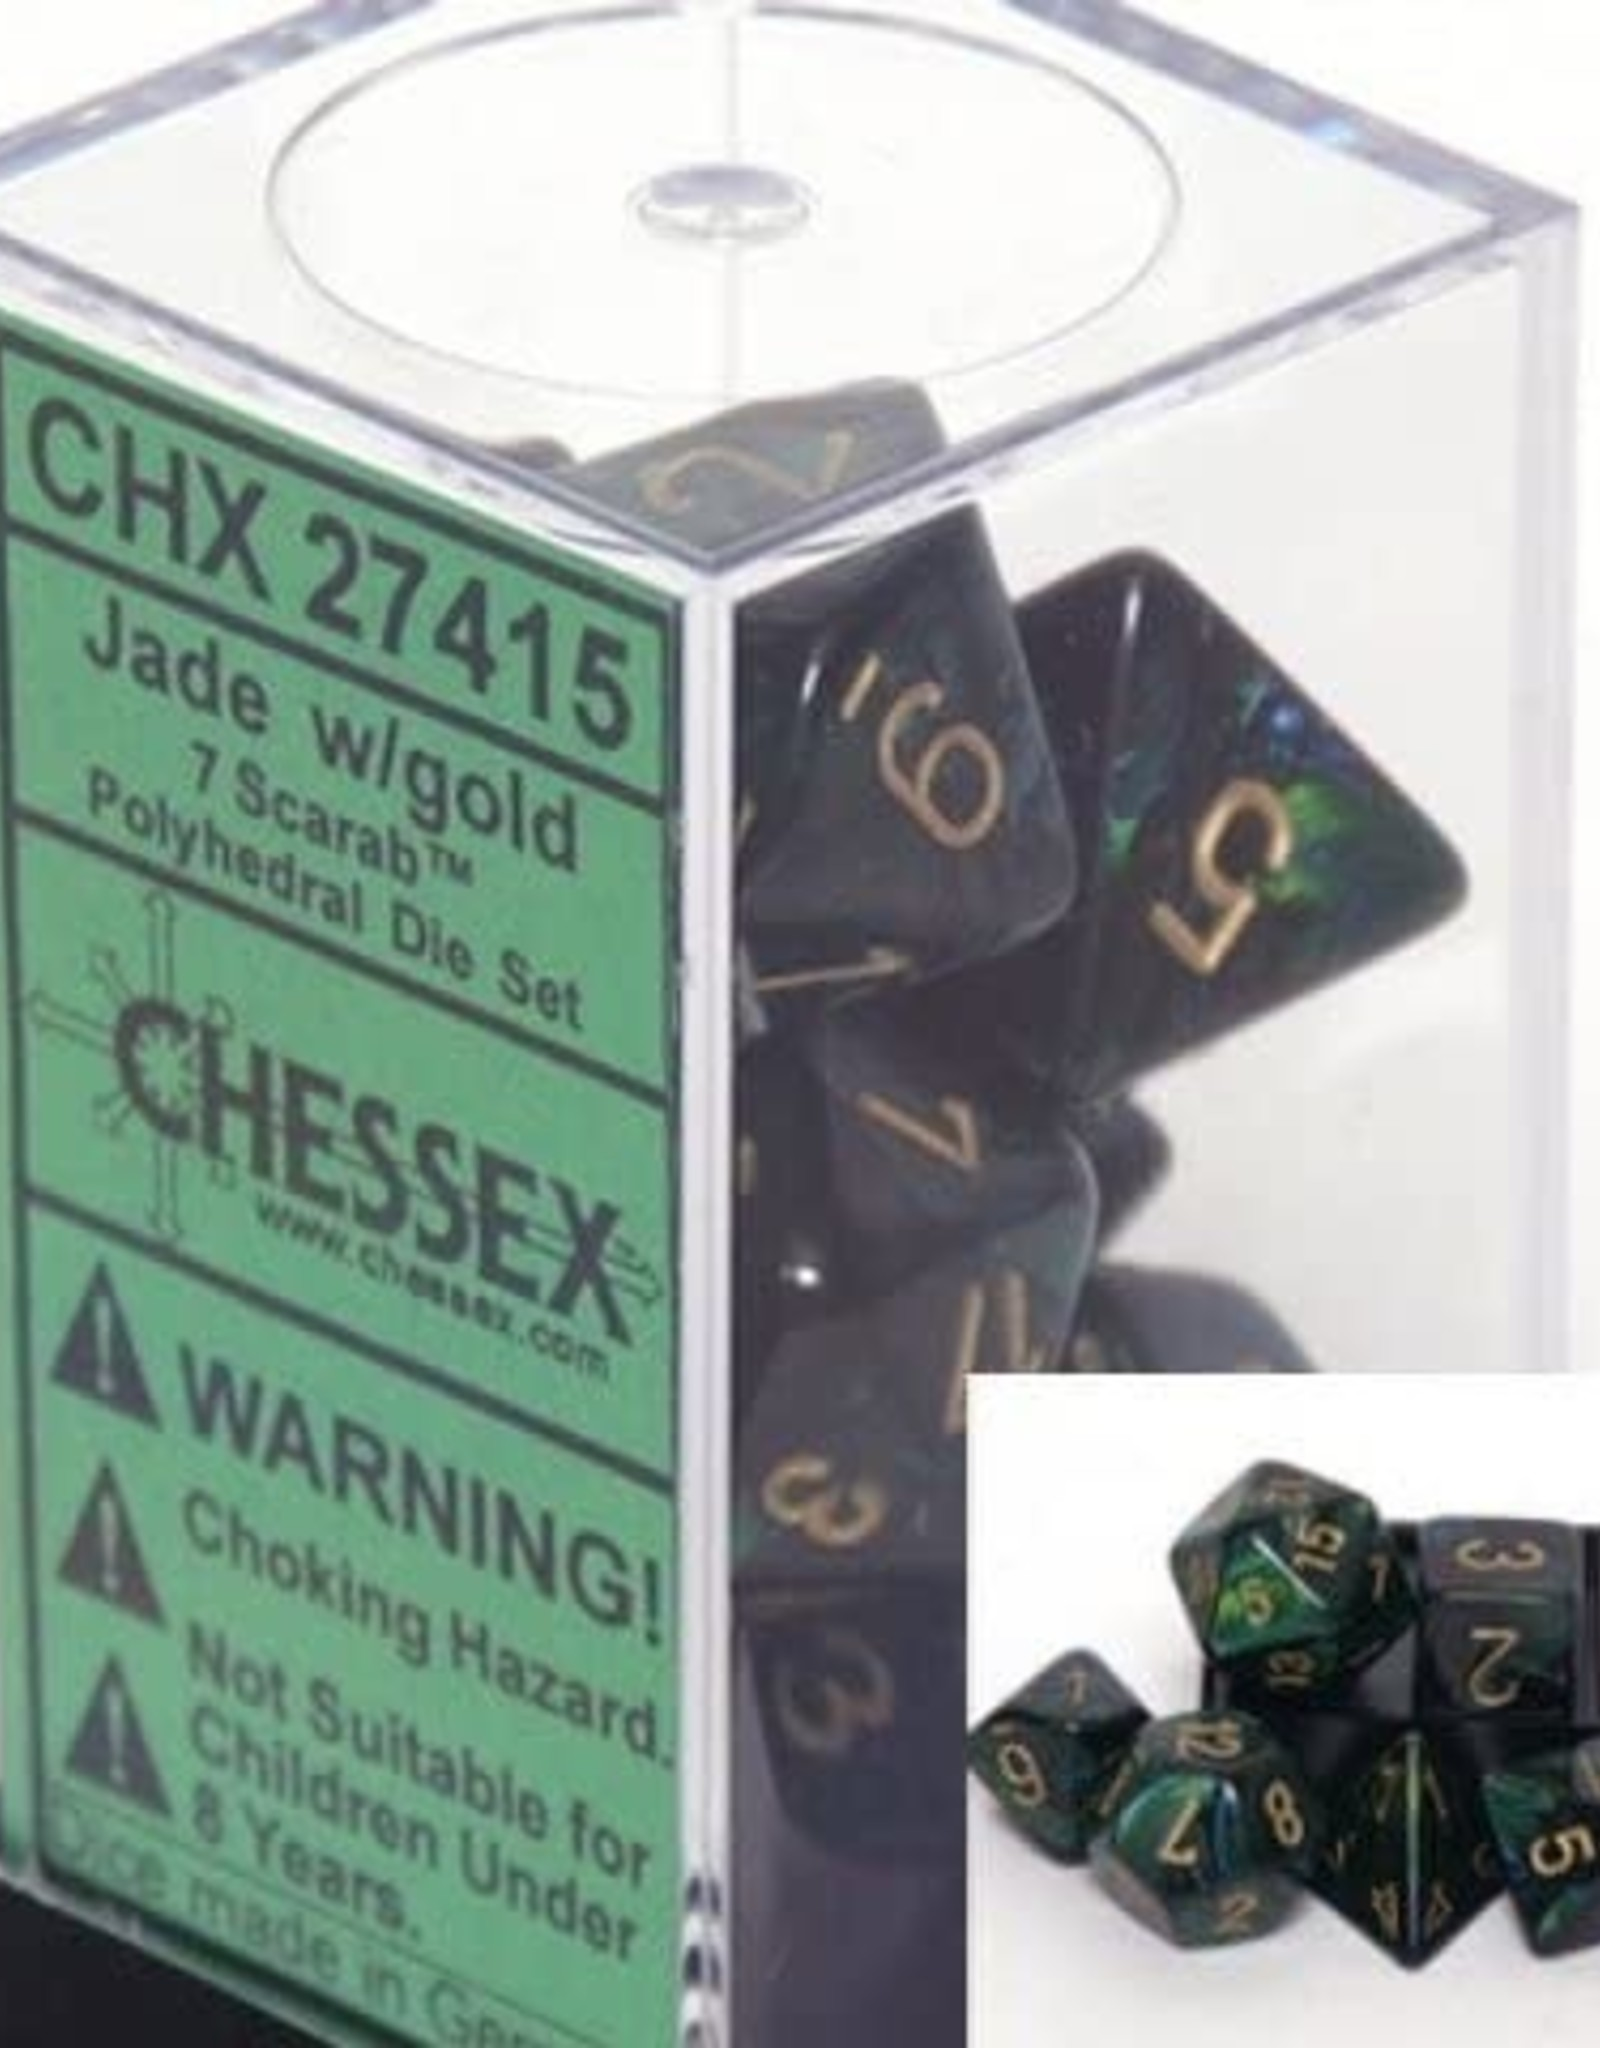 Chessex Scarab Jade w/gold Polyhedral Set